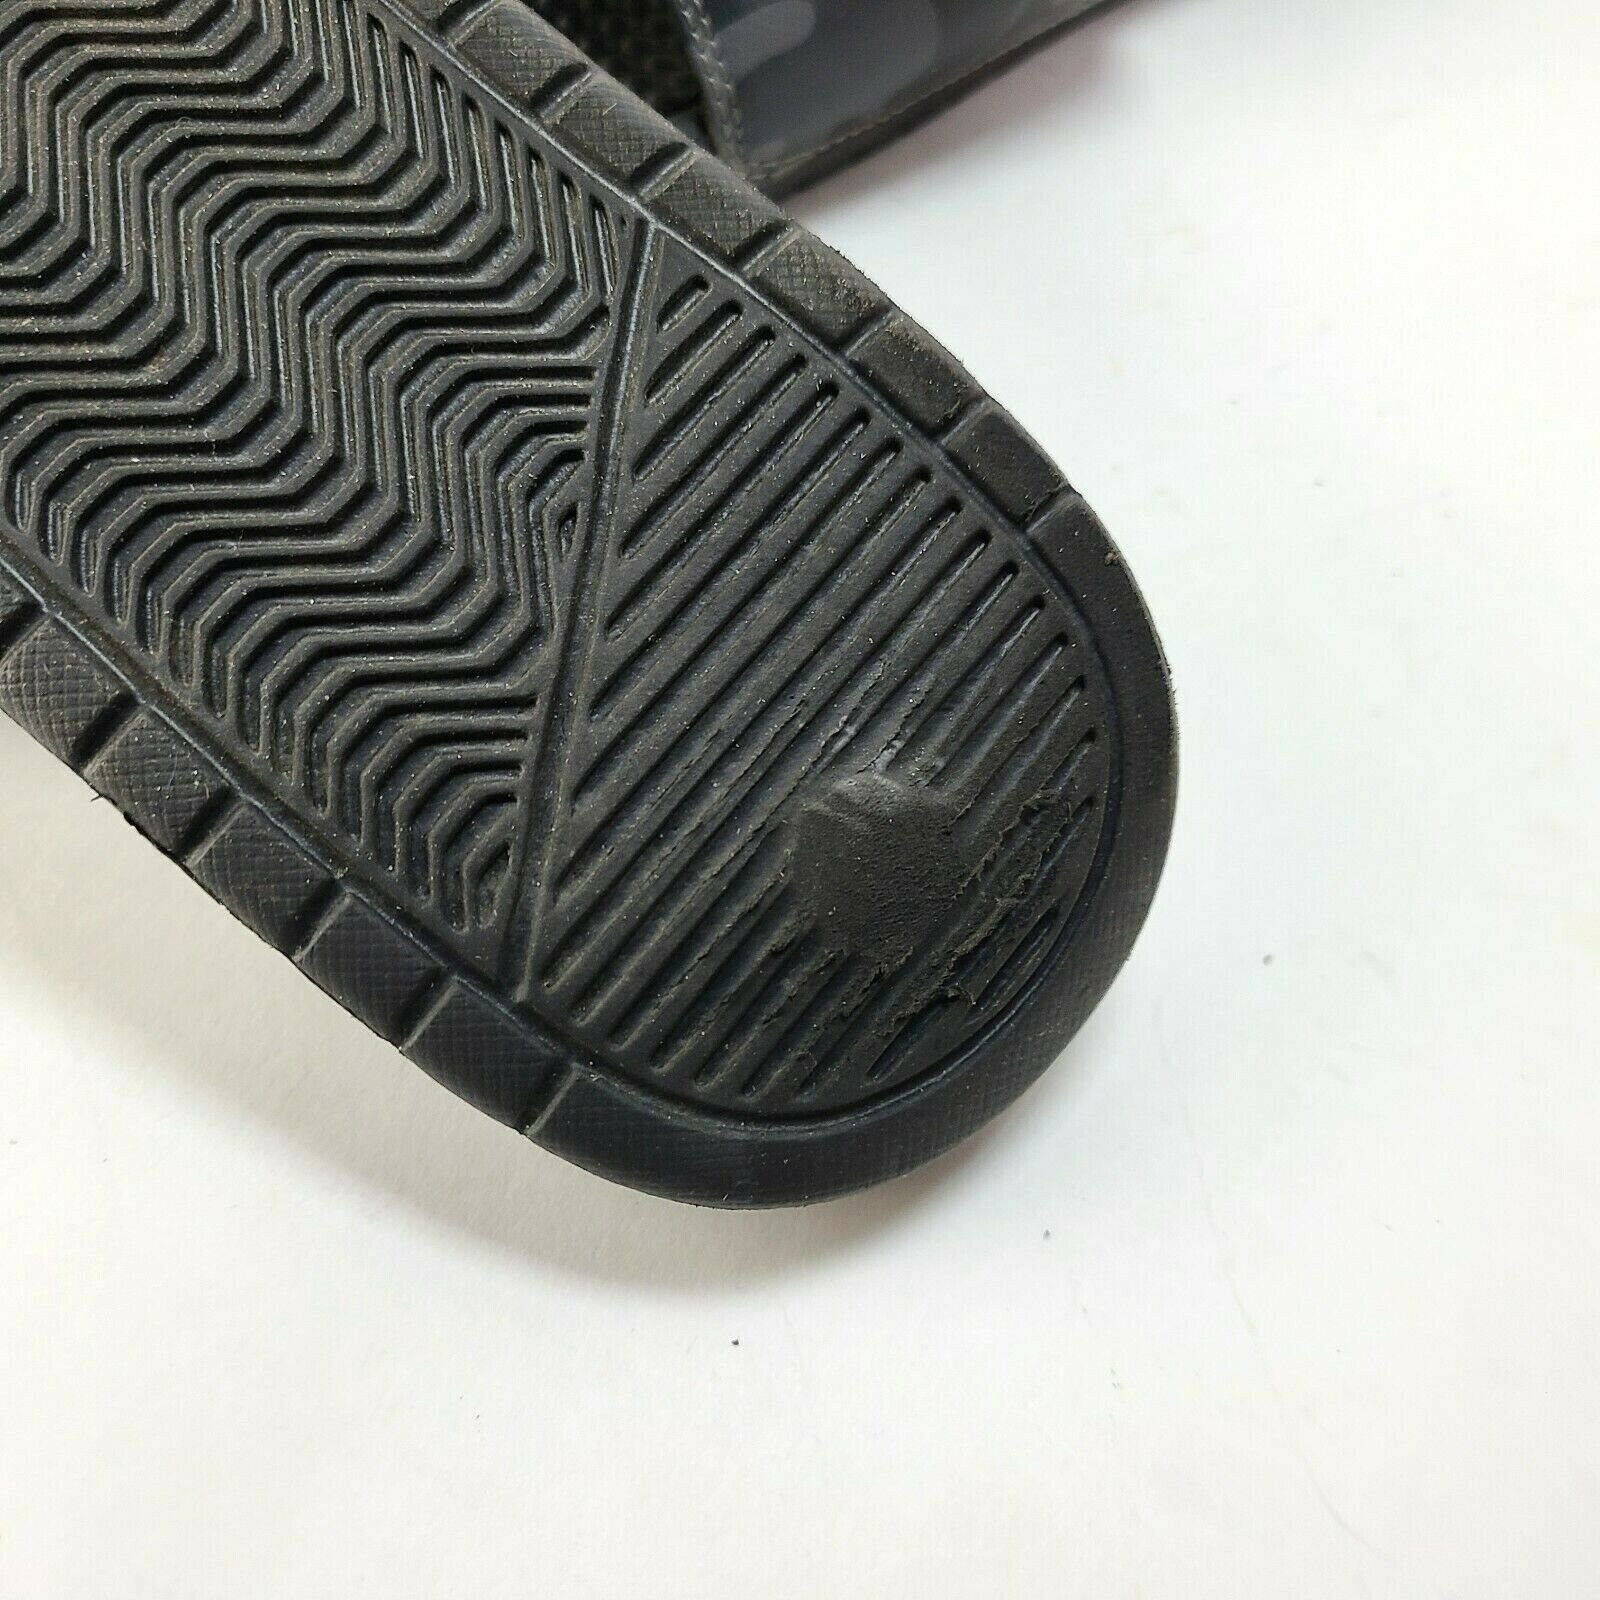 Nike Printed Sports Slide Sandals Men's Size 10 Black Camo